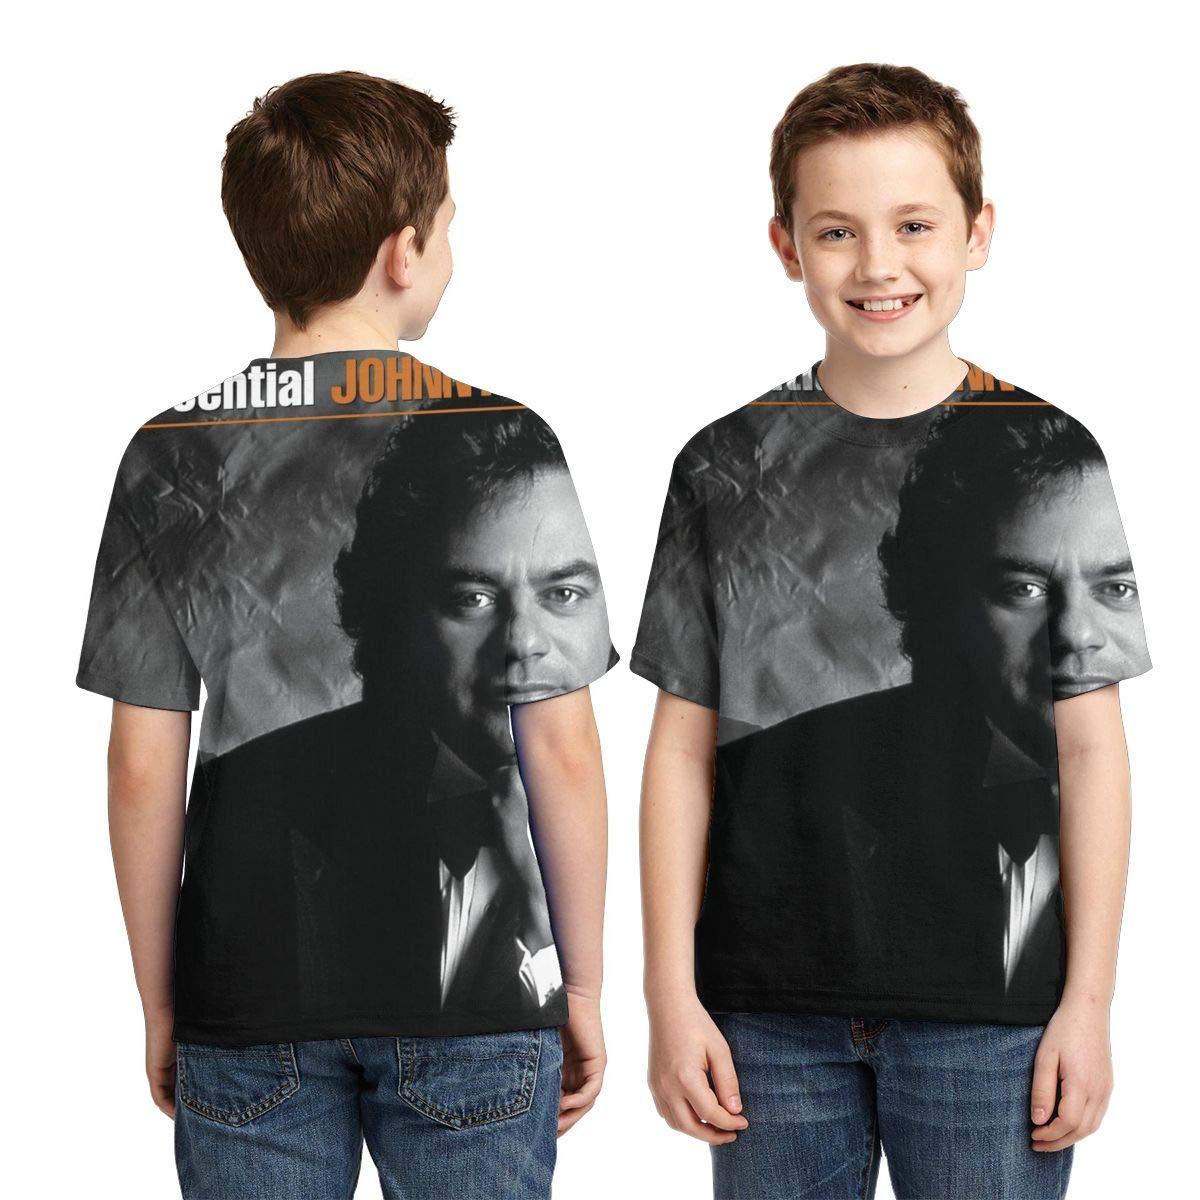 BowersJ Childrens Johnny Mathis The Essential Johnny Mathis Design 3D Printed Short Sleeve Tshirts for Girls /& Boys Black